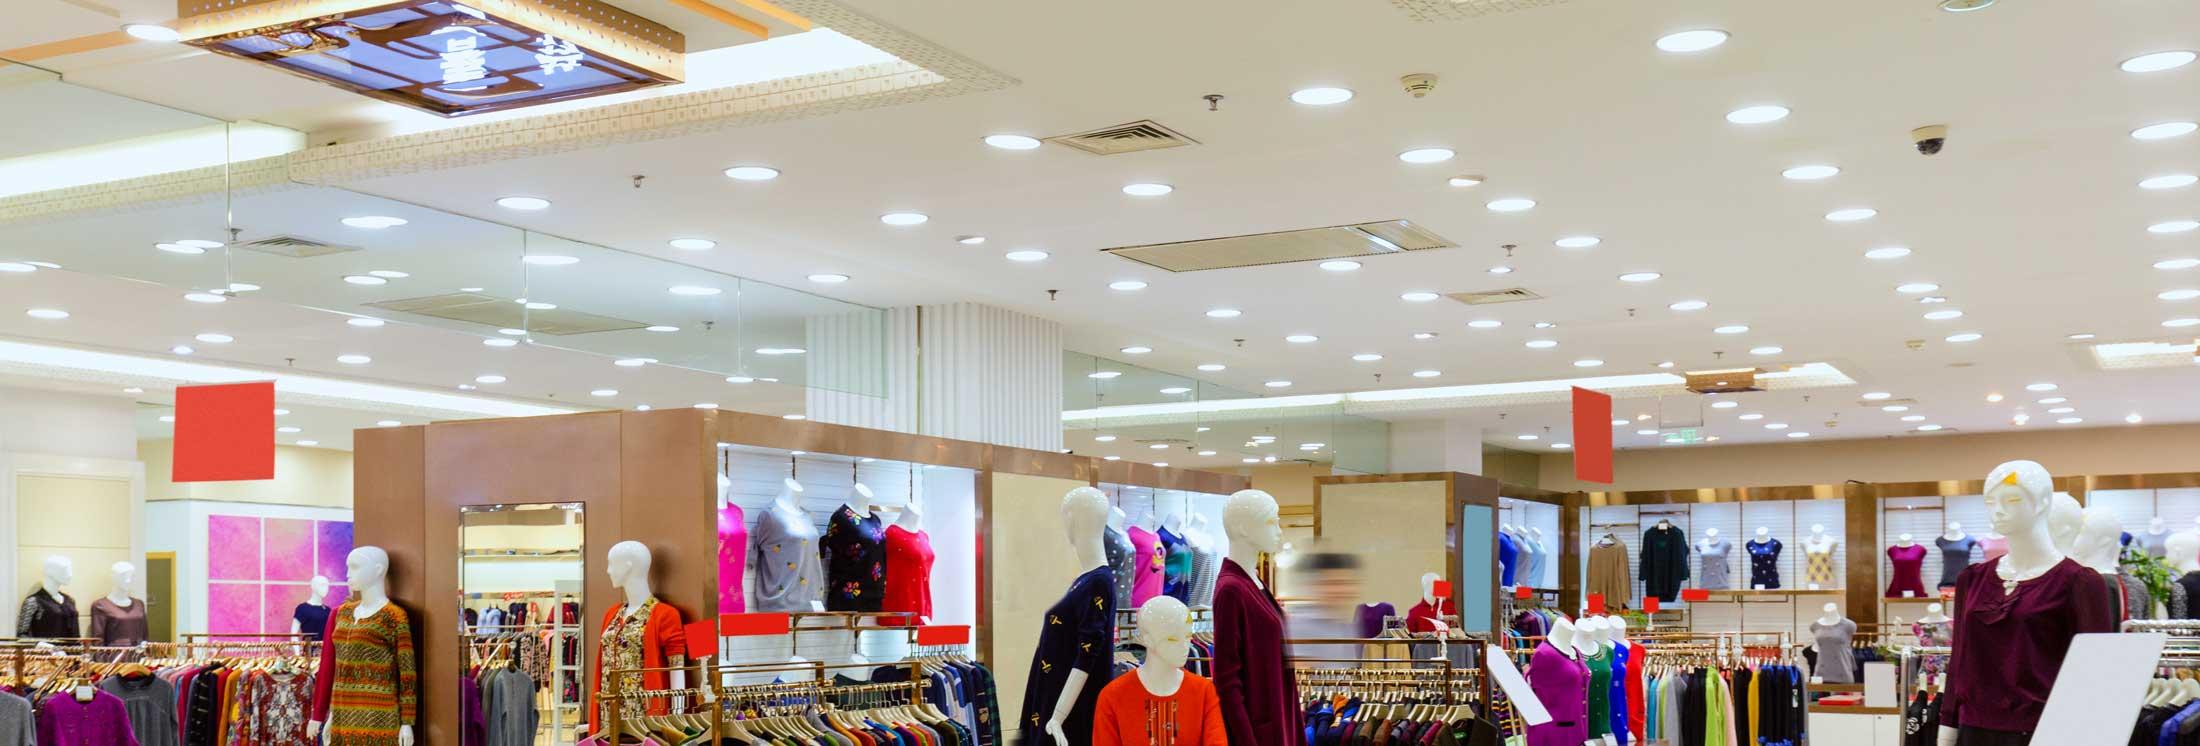 Department Store & Large Retail Shop LED Lighting - LED UK